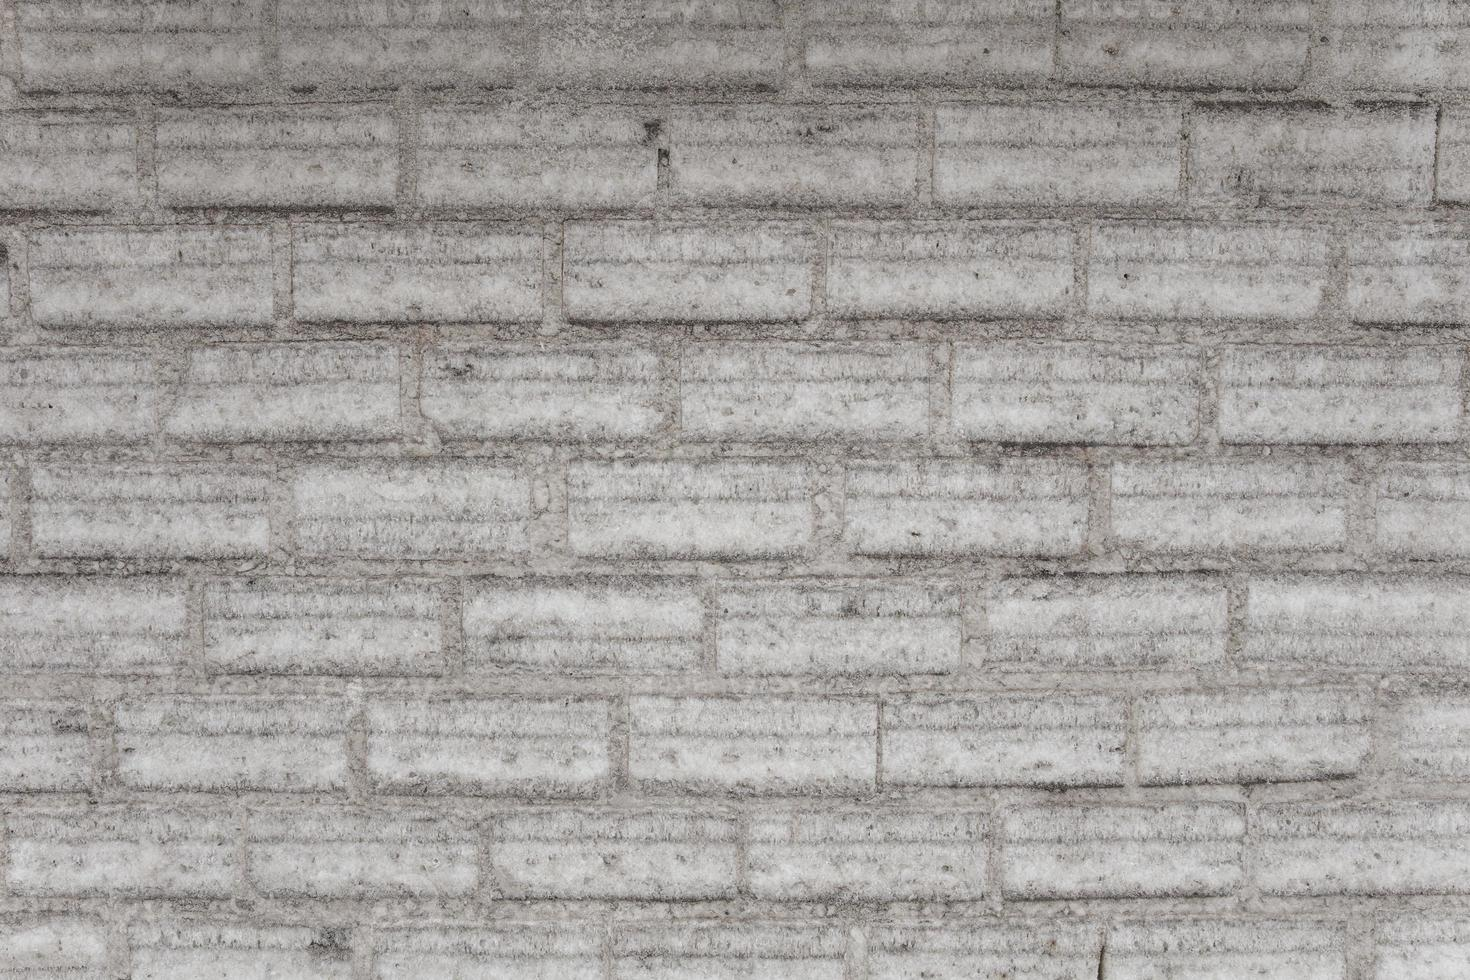 oude vintage witte bakstenen muur foto